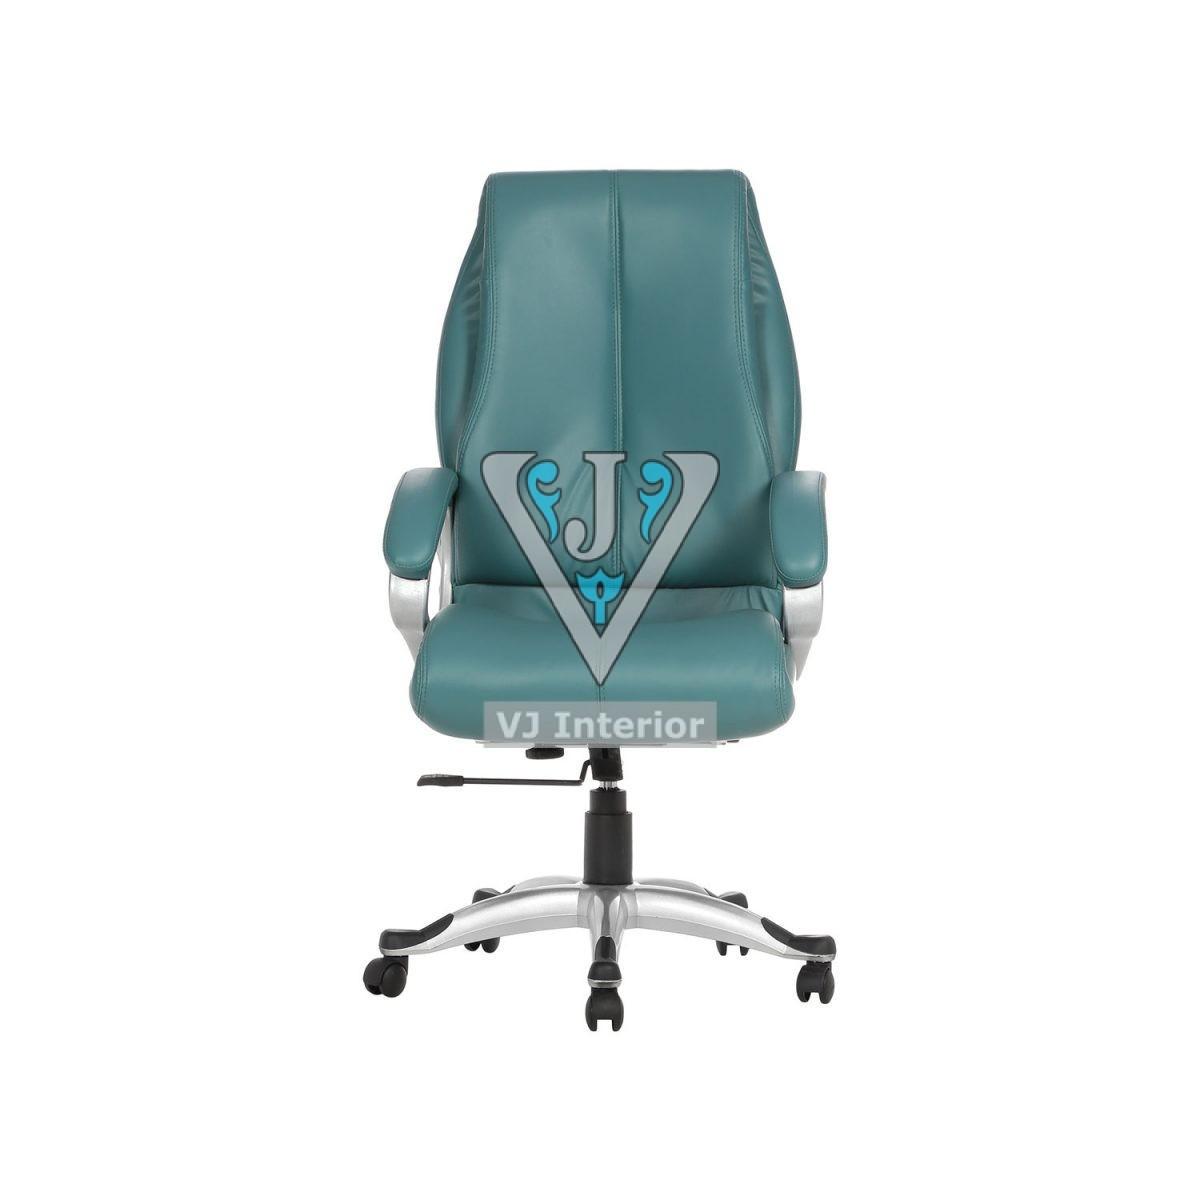 The Puntada Hb Executive Chair Ocean Green